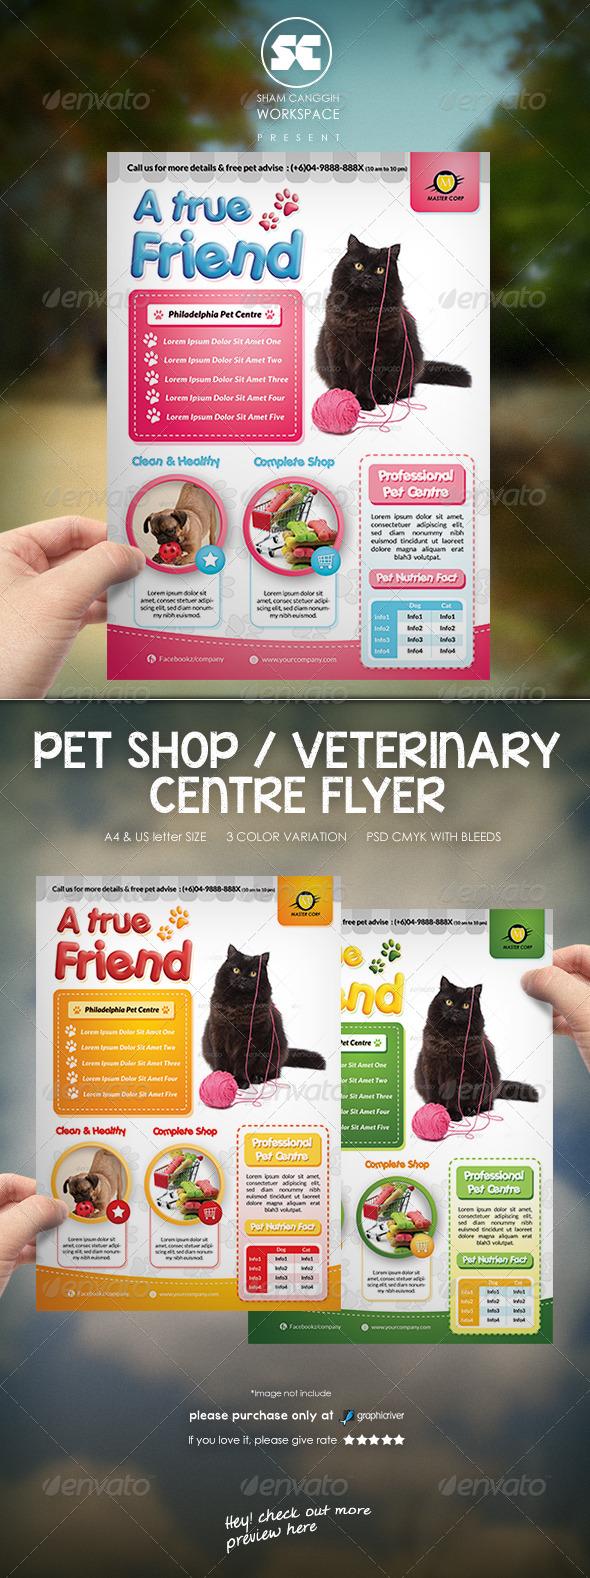 GraphicRiver Pet Shop Veterinary Centre Flyer 7601839